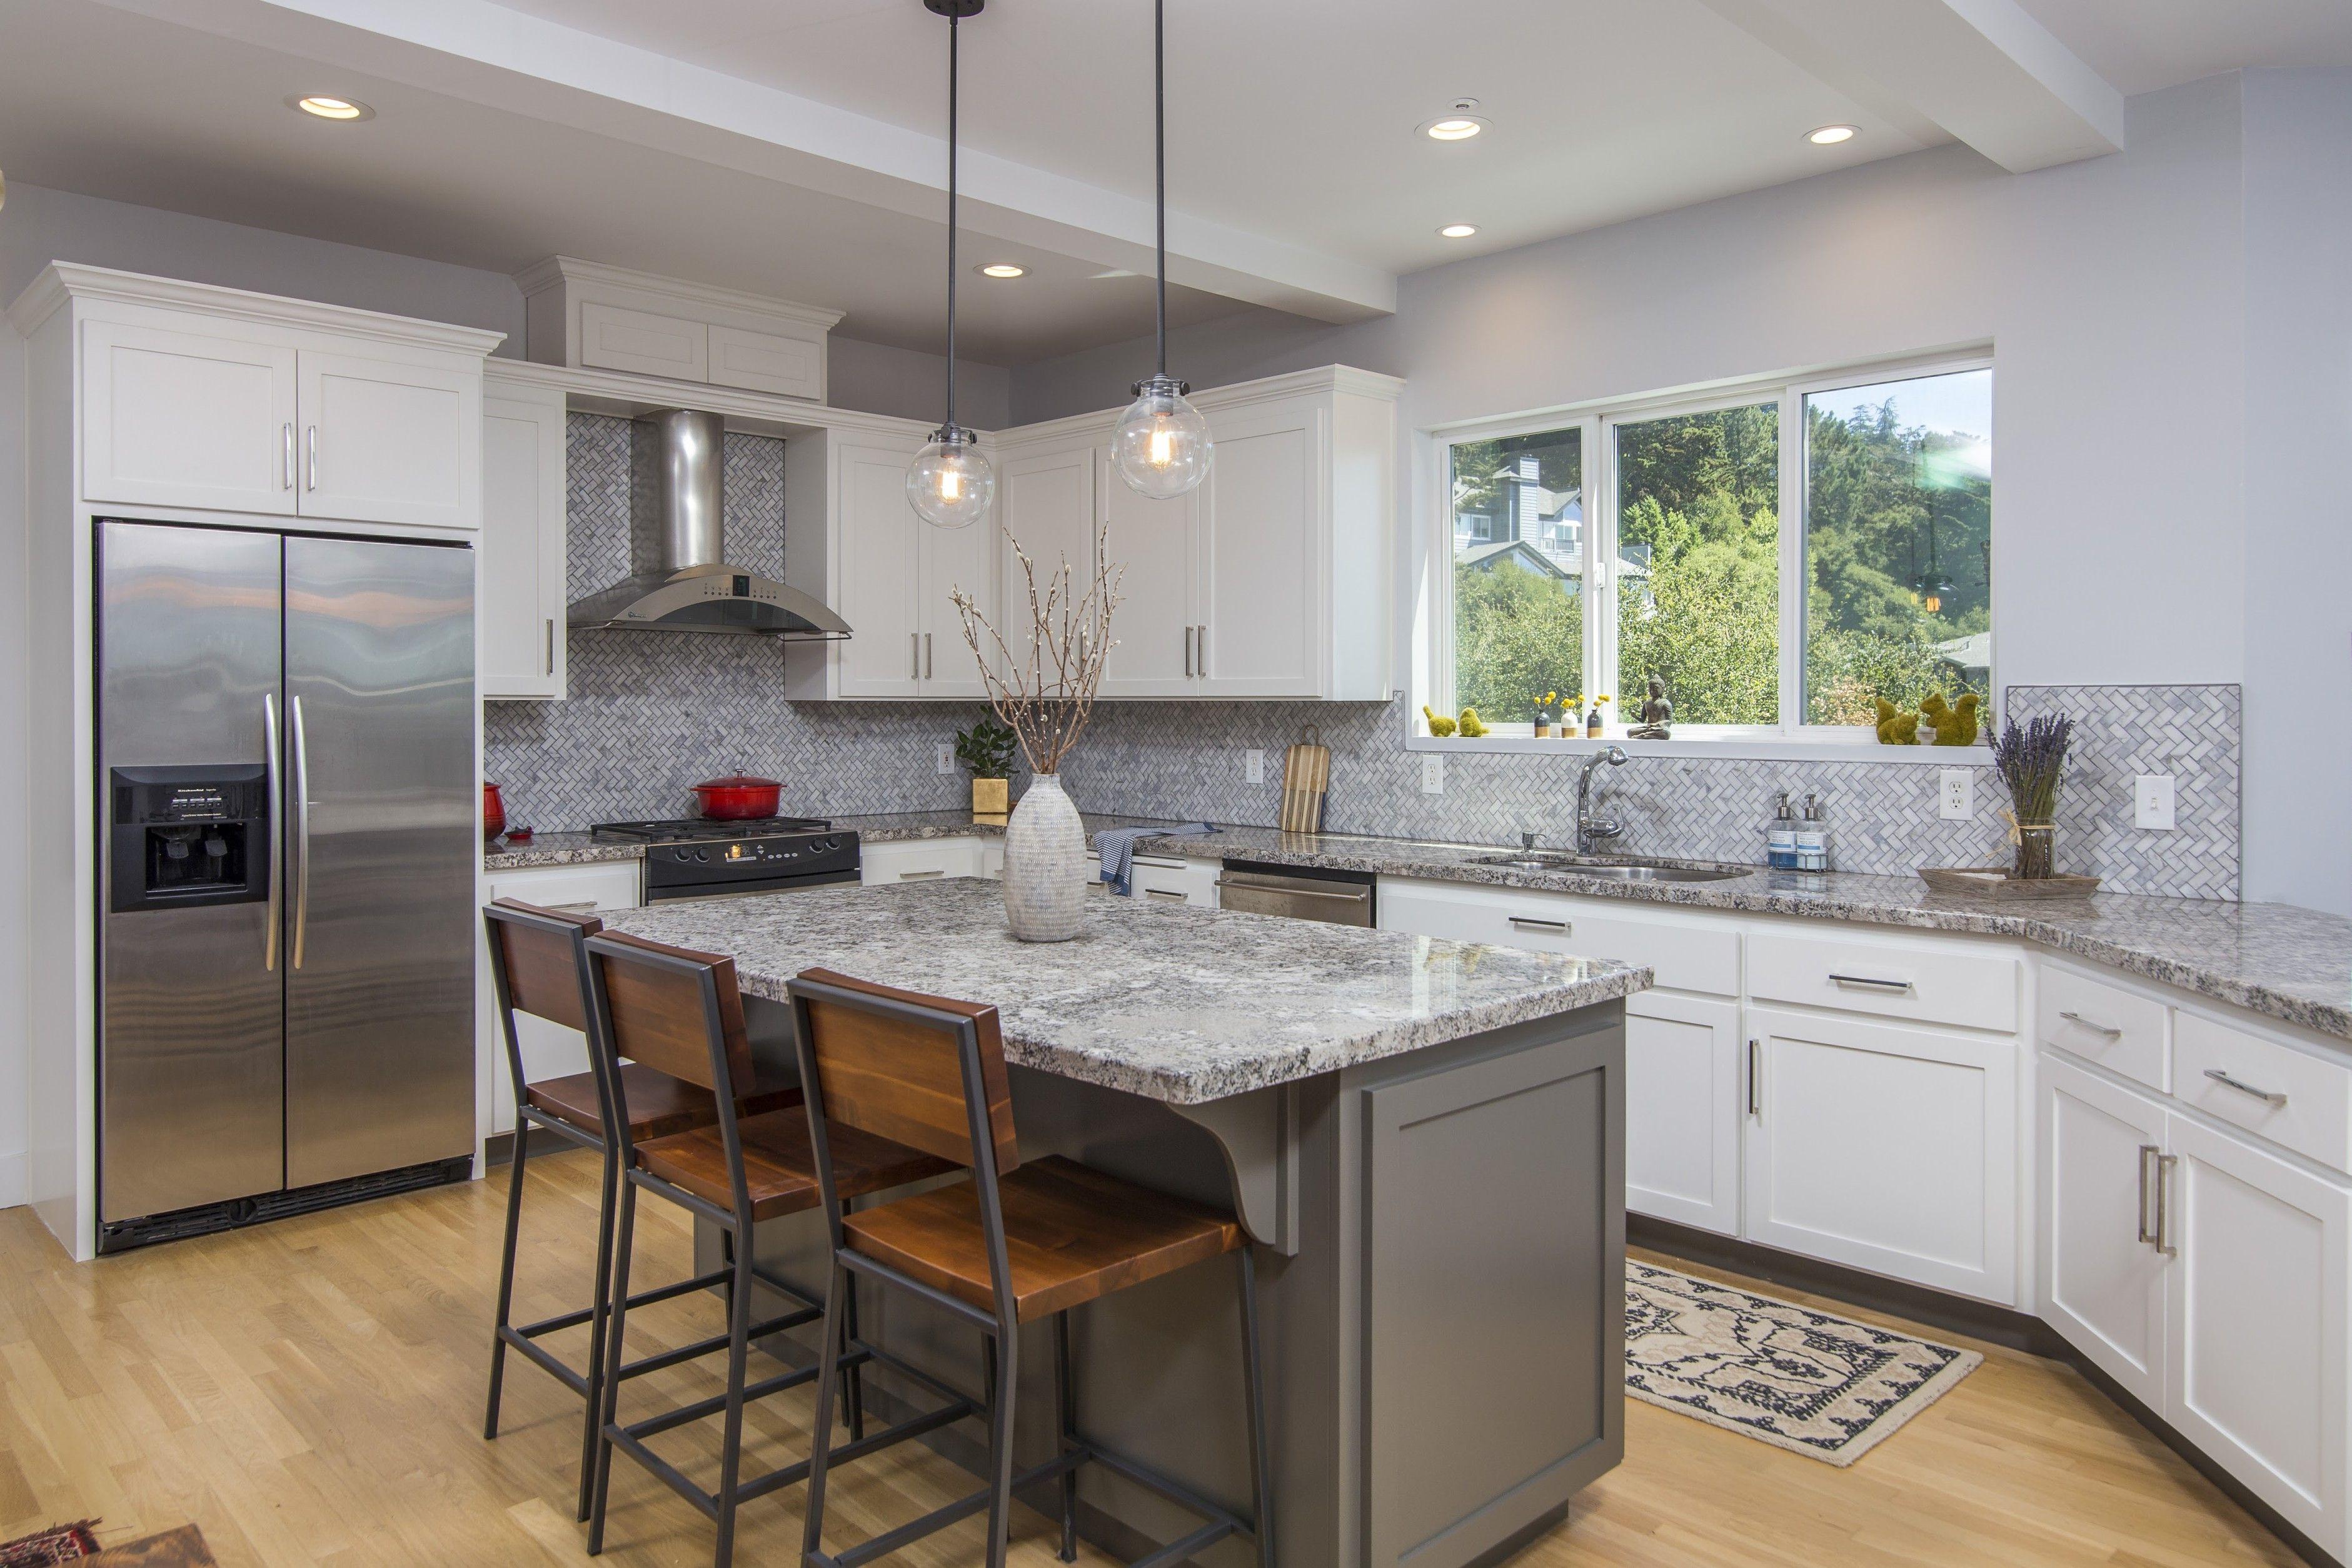 kitchen island gray with wood barstools grey kitchen island house interior wood bar stools on kitchen interior grey wood id=78802